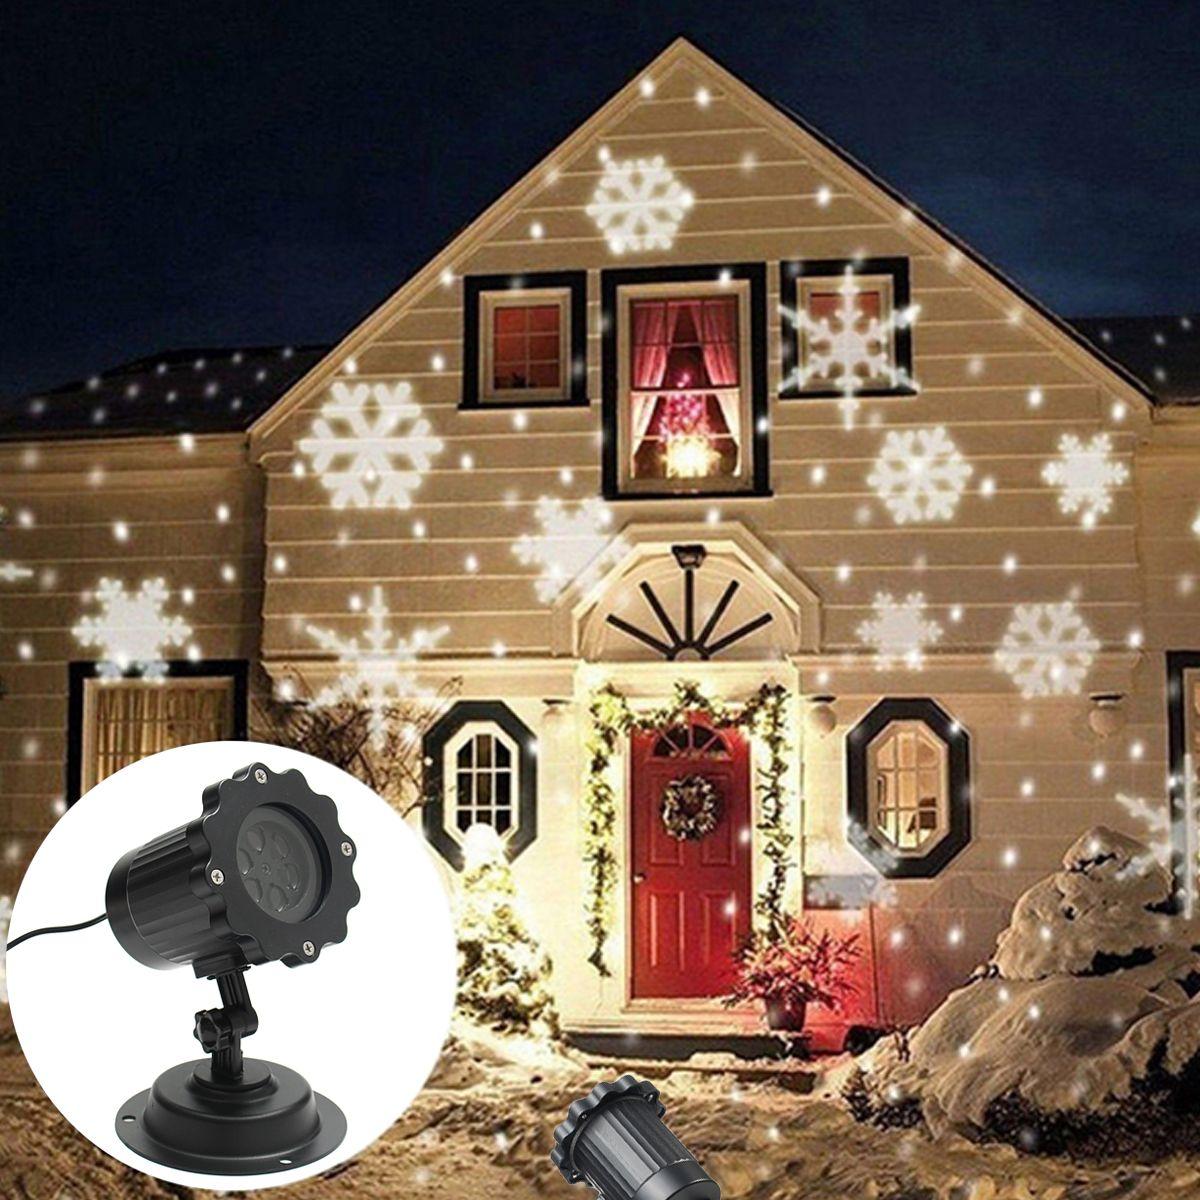 Proiettore Luci Natale Bianche.Proiettore Di Luce Laser Bianco Per Esterni A Led In Movimento Di Natale Led Eu Us Au Uk 100 240v Impermeabile 4 Luci A Led Illuminazione